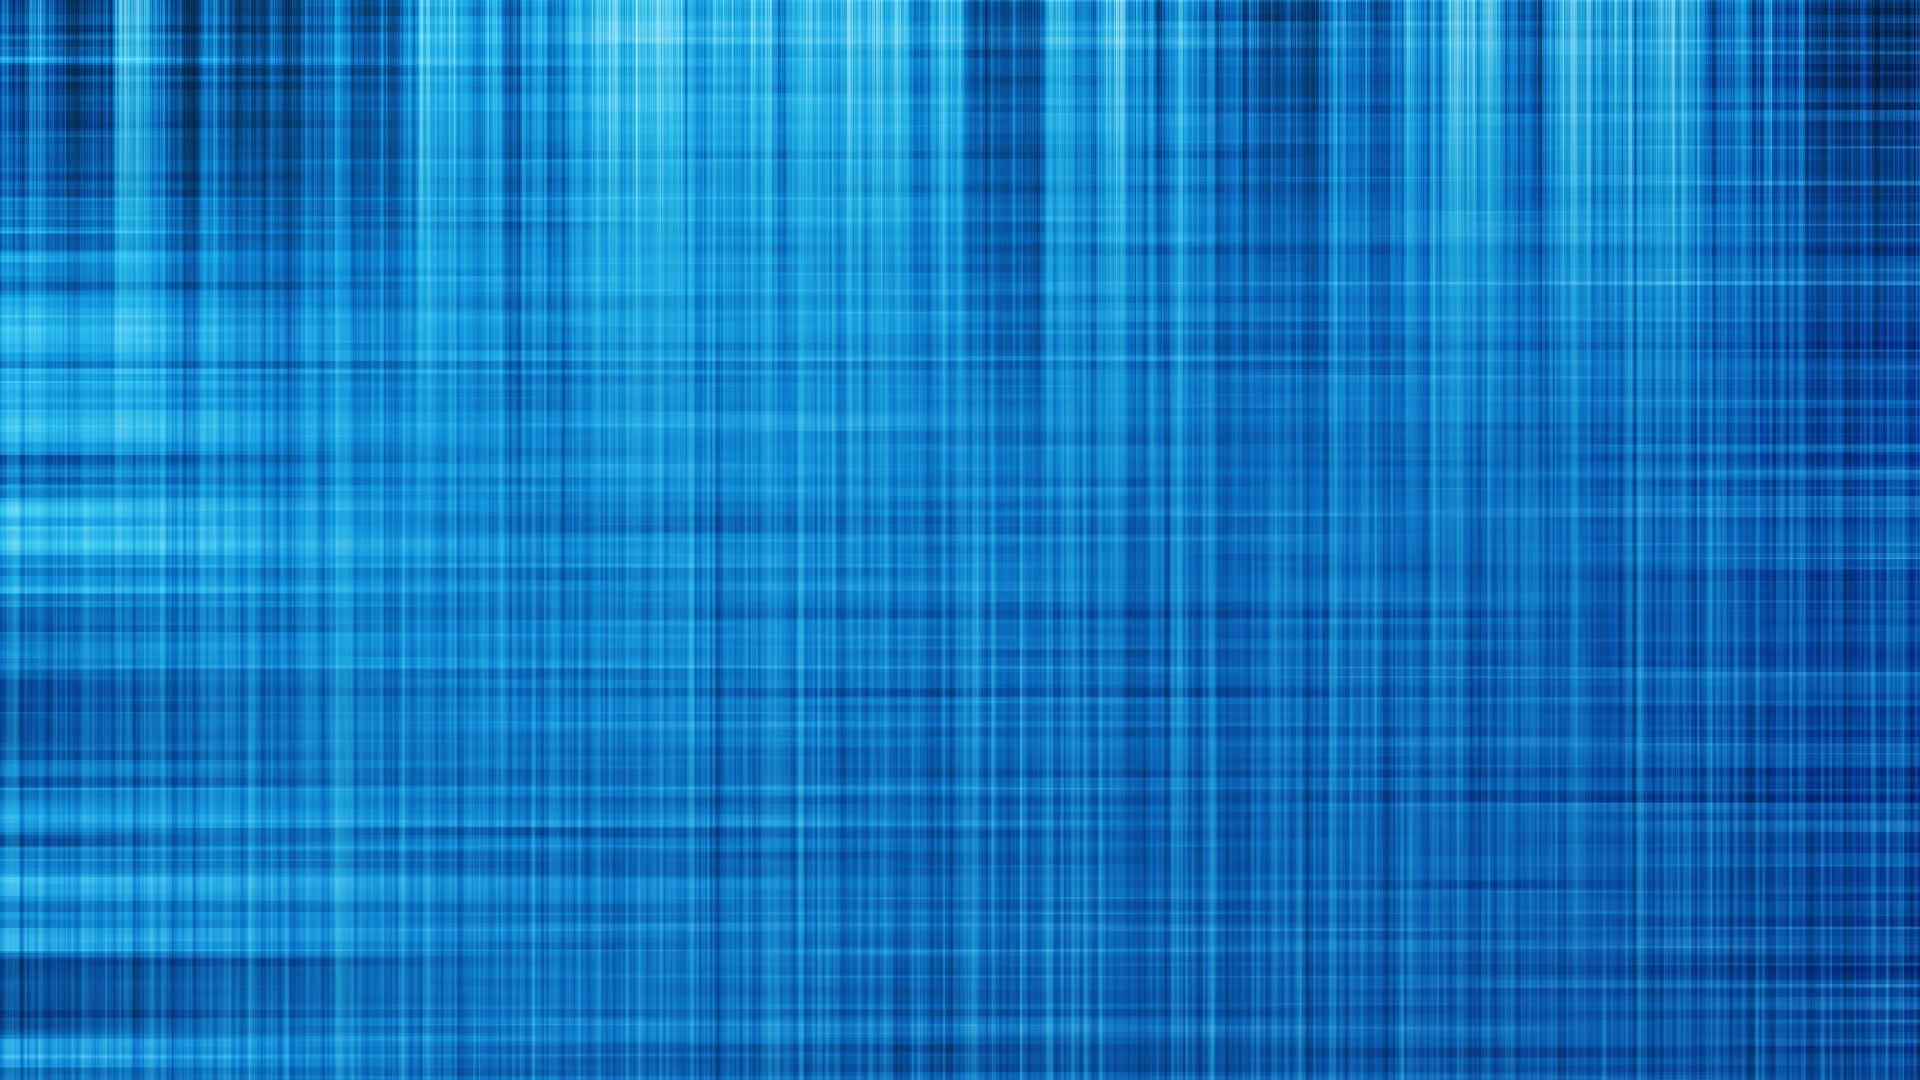 Blue Texture Wallpaper – WallpaperSafari